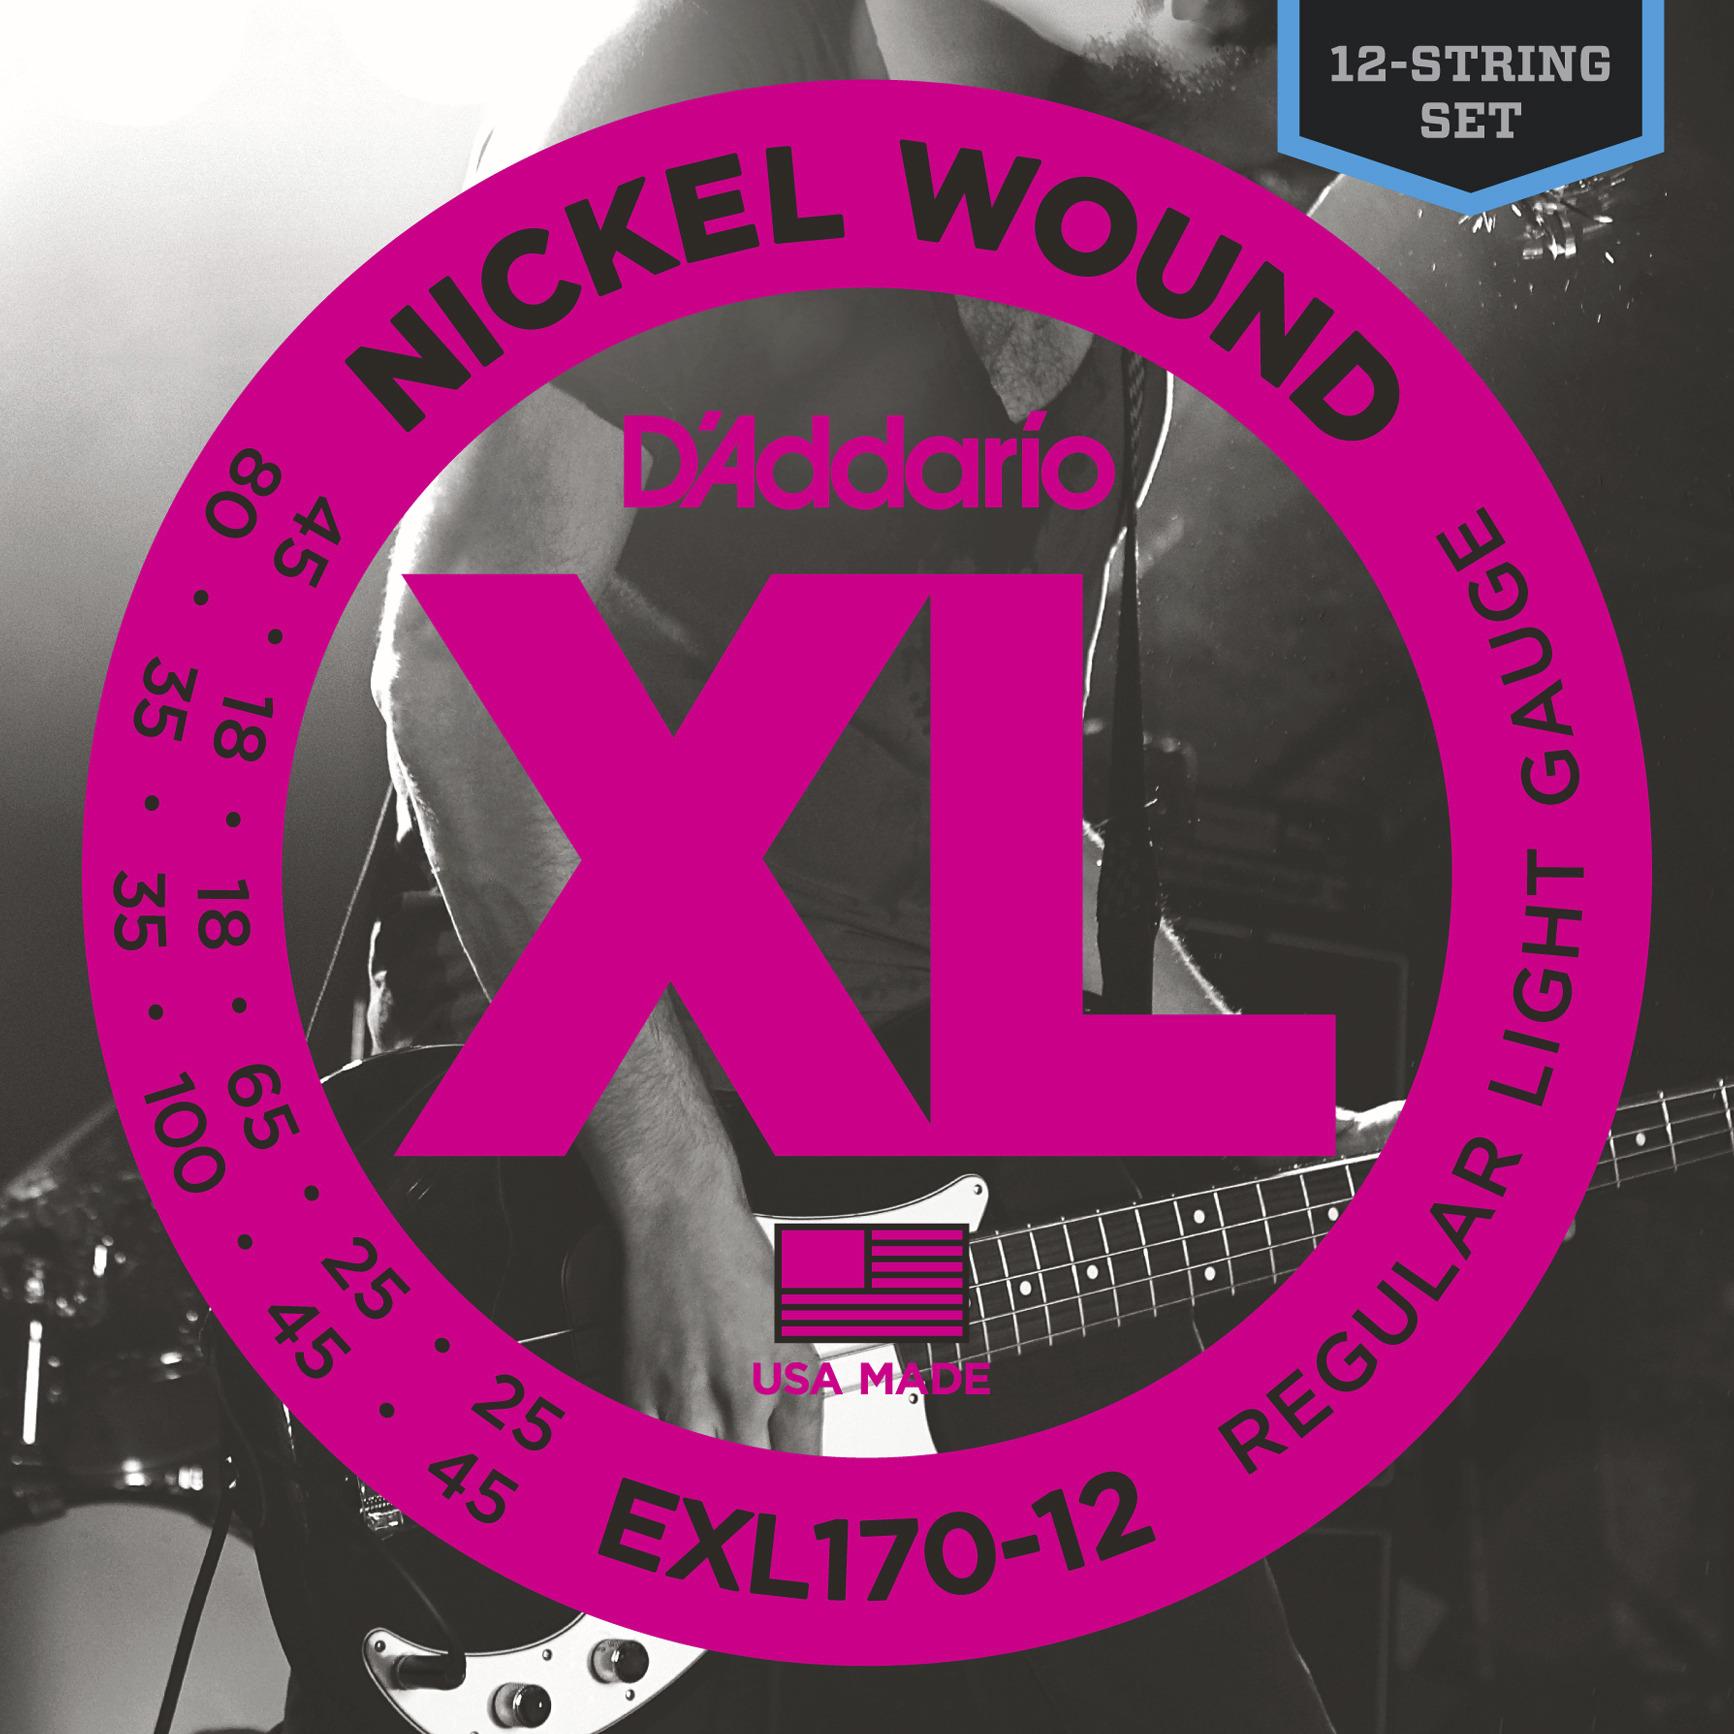 Daddario EXL170-12 Saitensatz für E-Bass 12-Strin